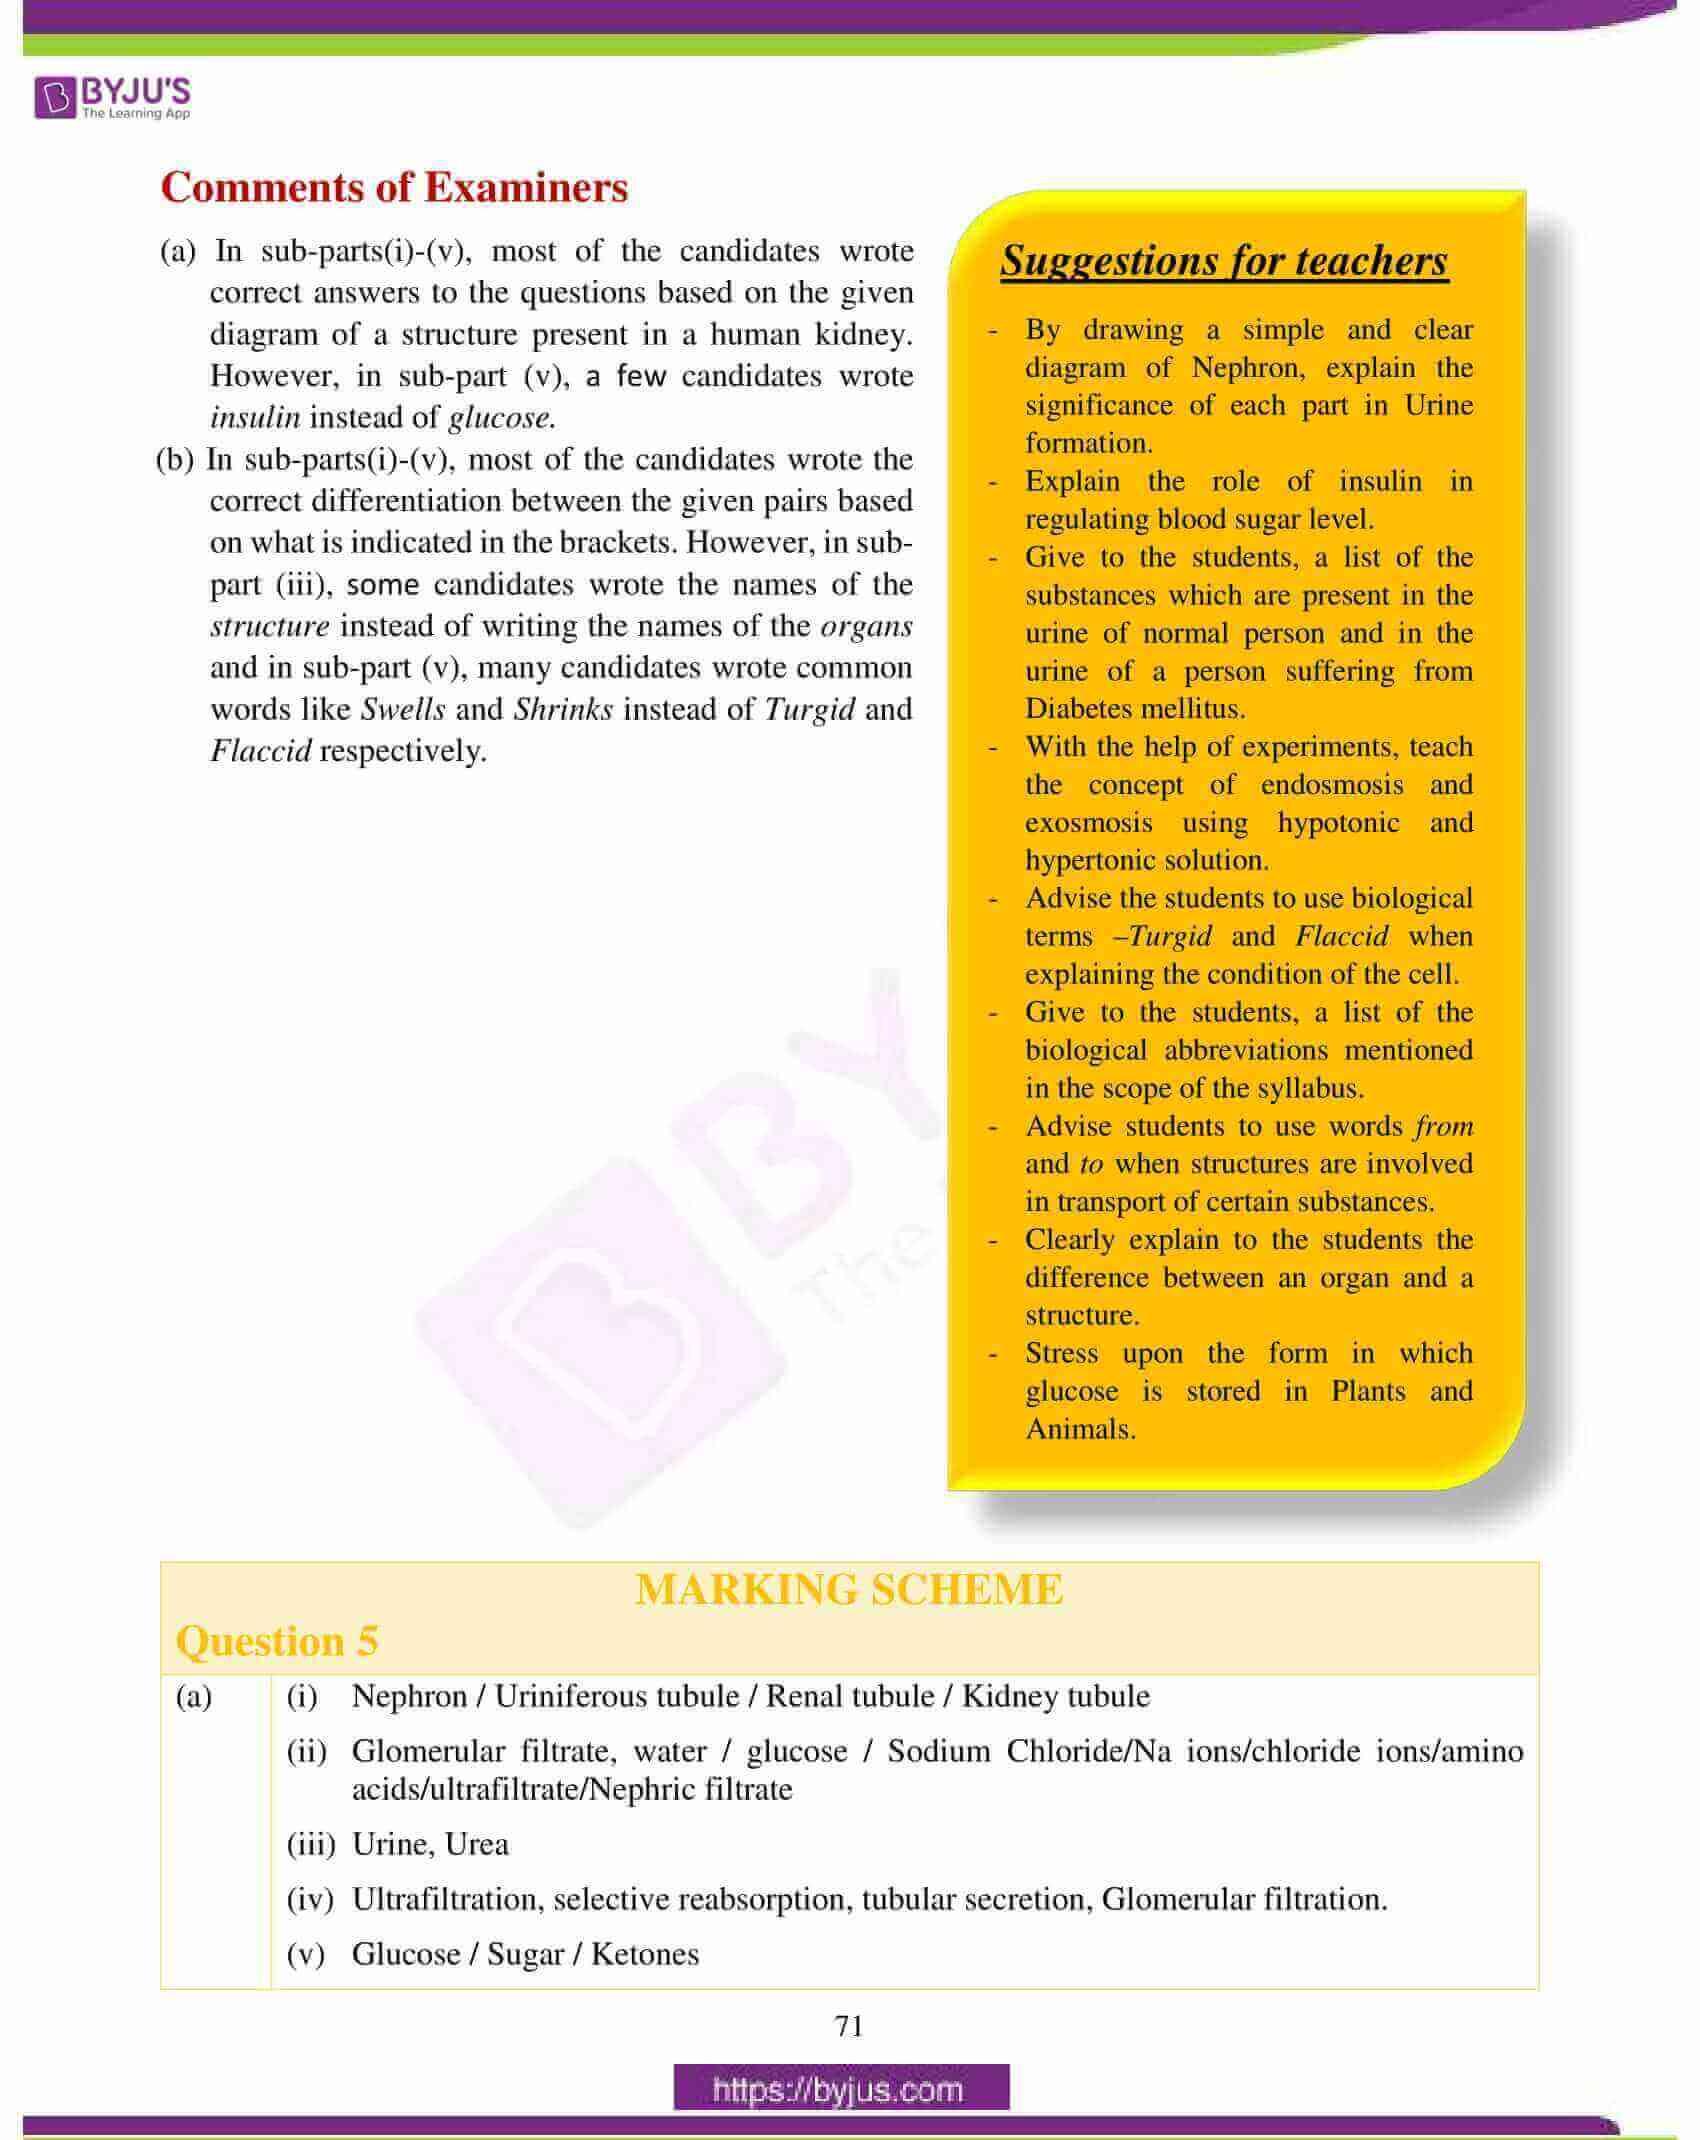 icse class 10 biology question paper solution 2018 18